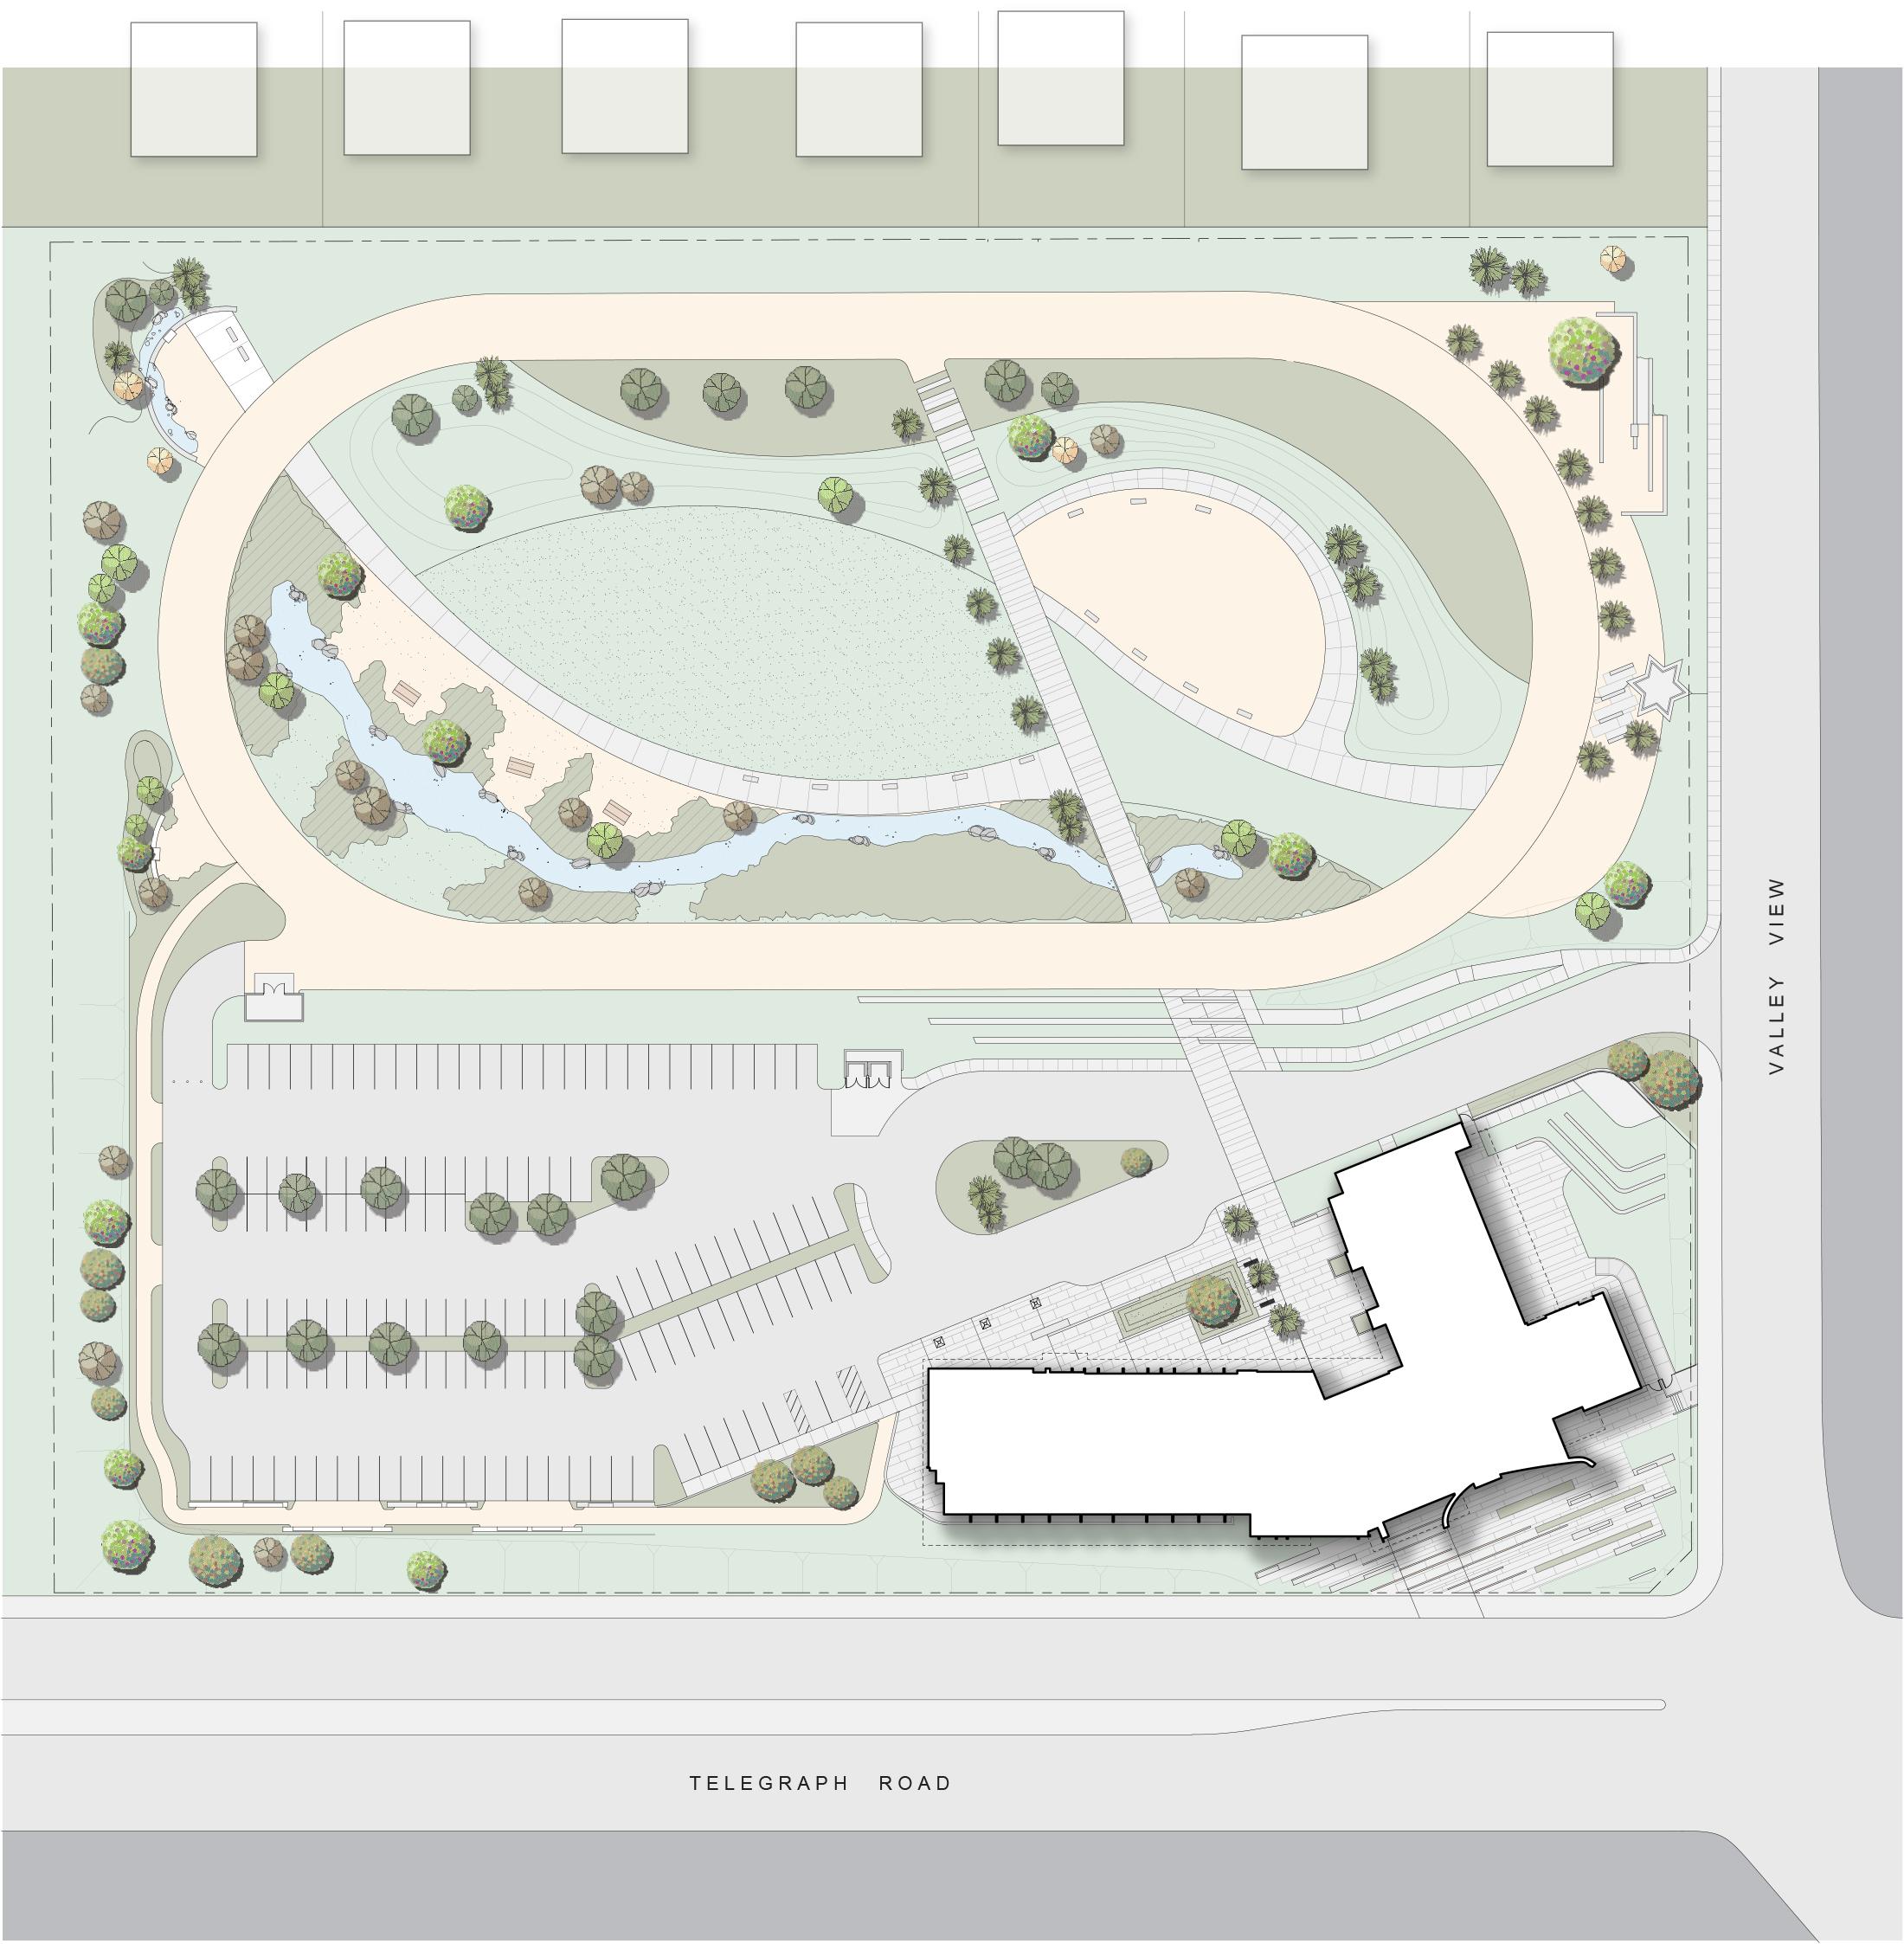 2012-10-10 site enlarged color 10x10.jpg